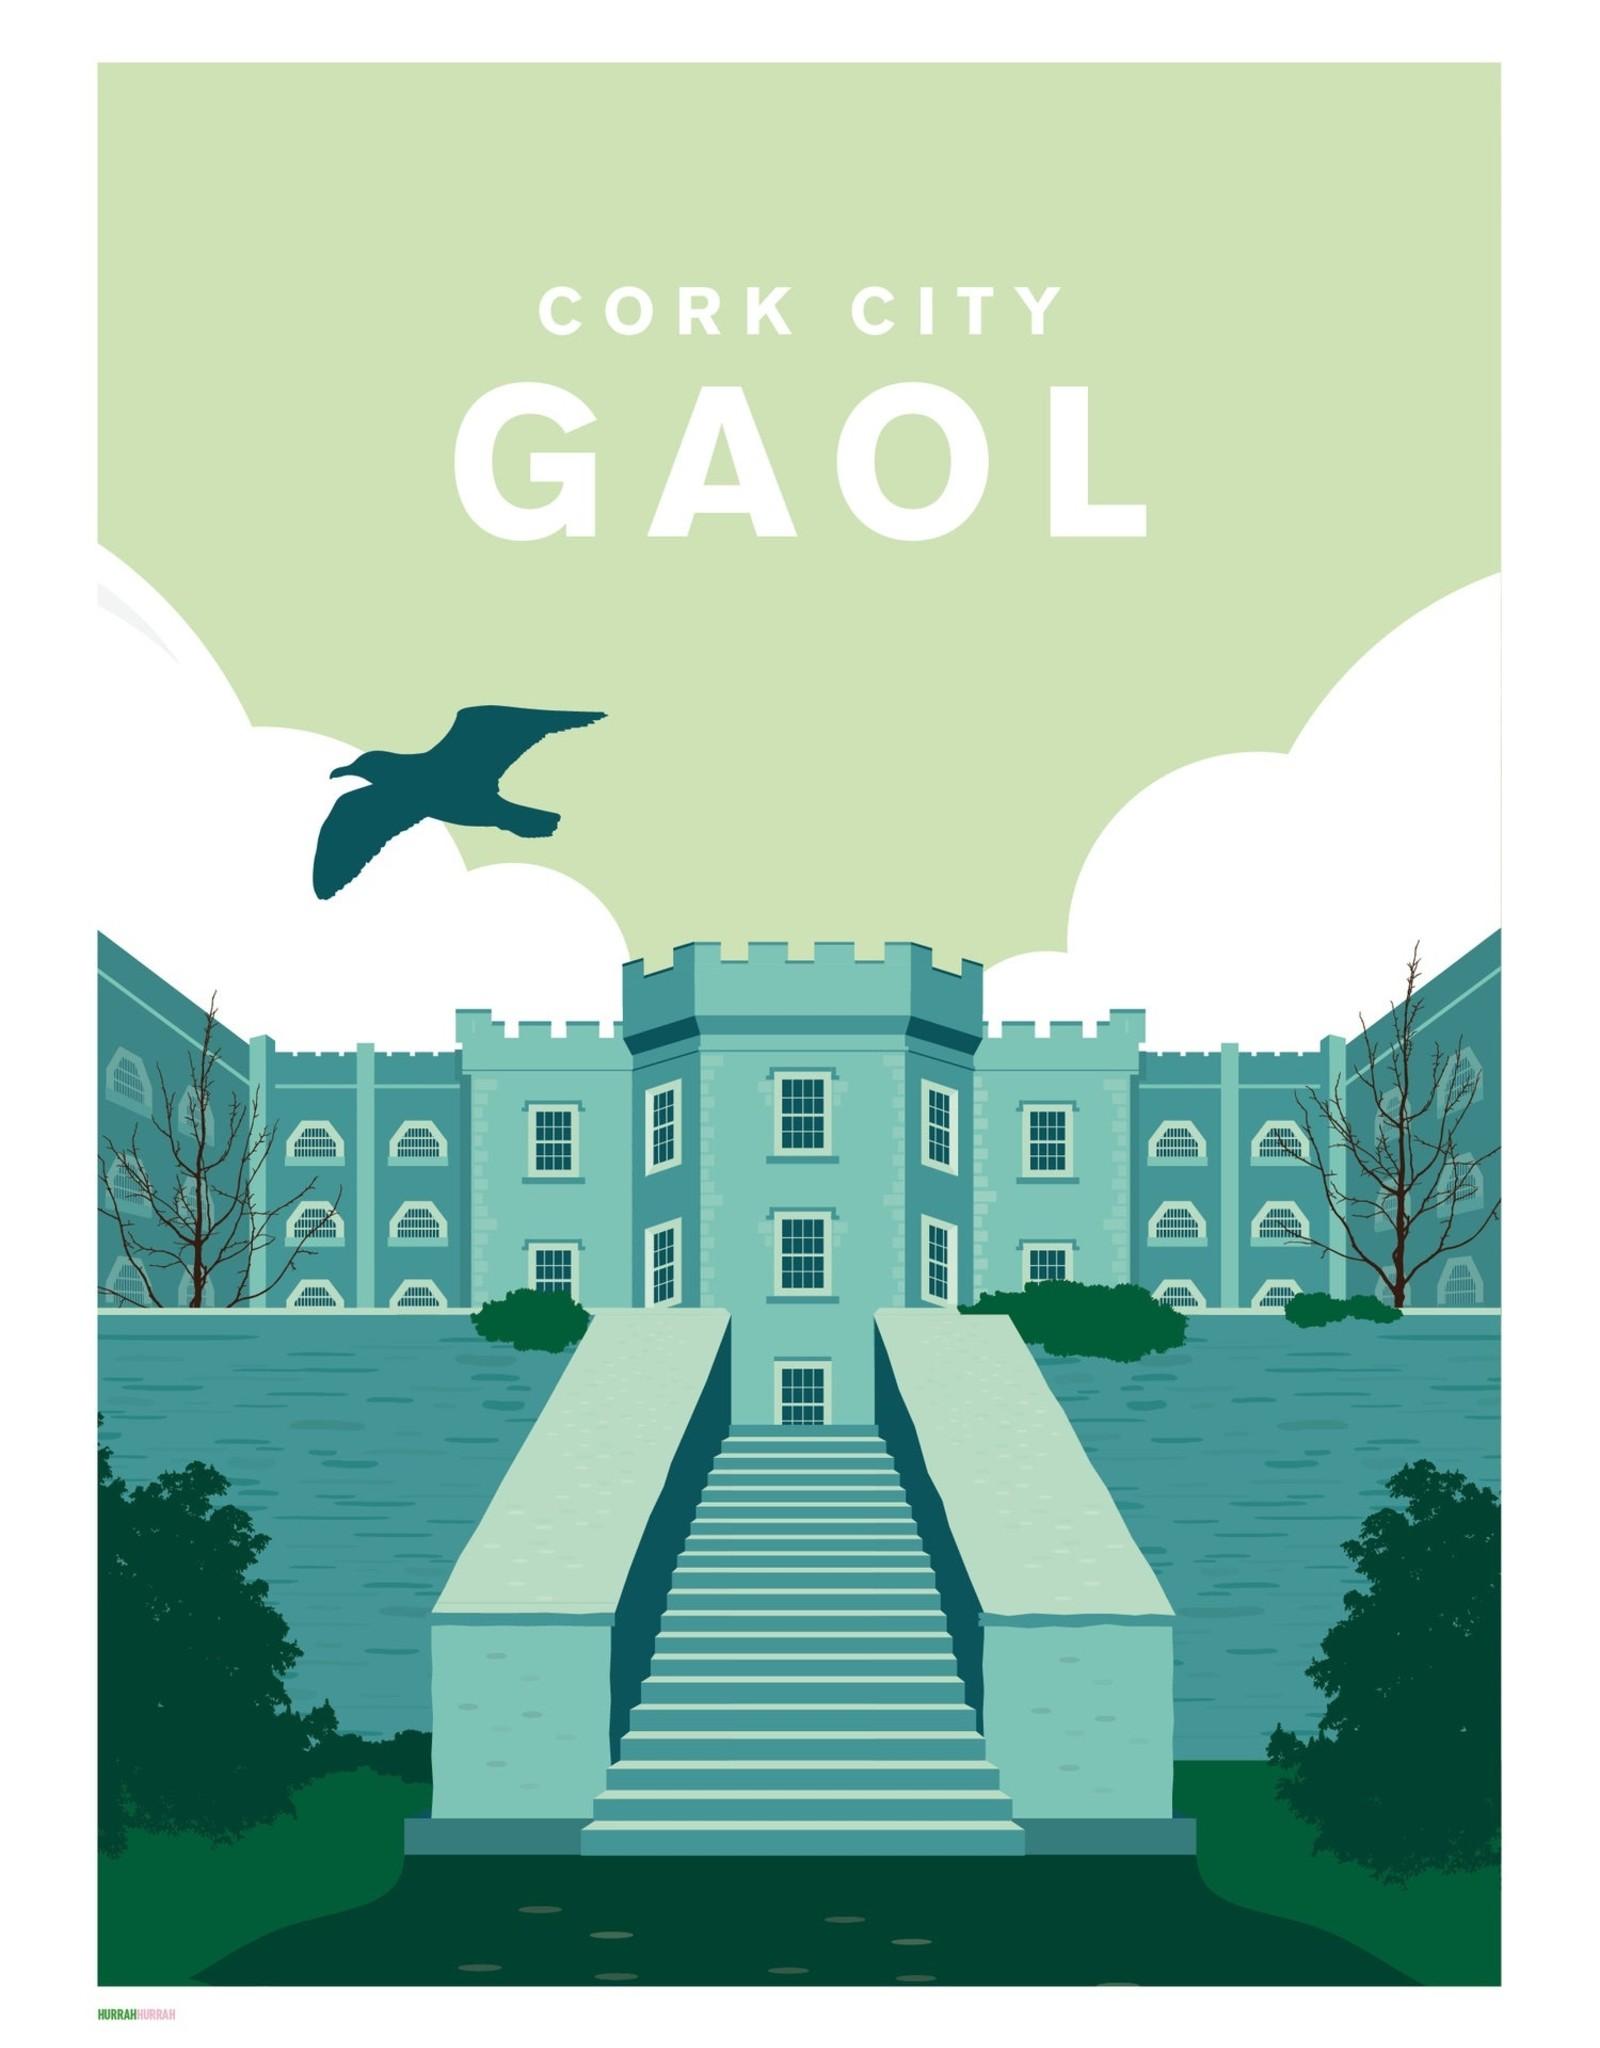 Hurrah Hurrah Hurrah Hurrah Cork City Gaol